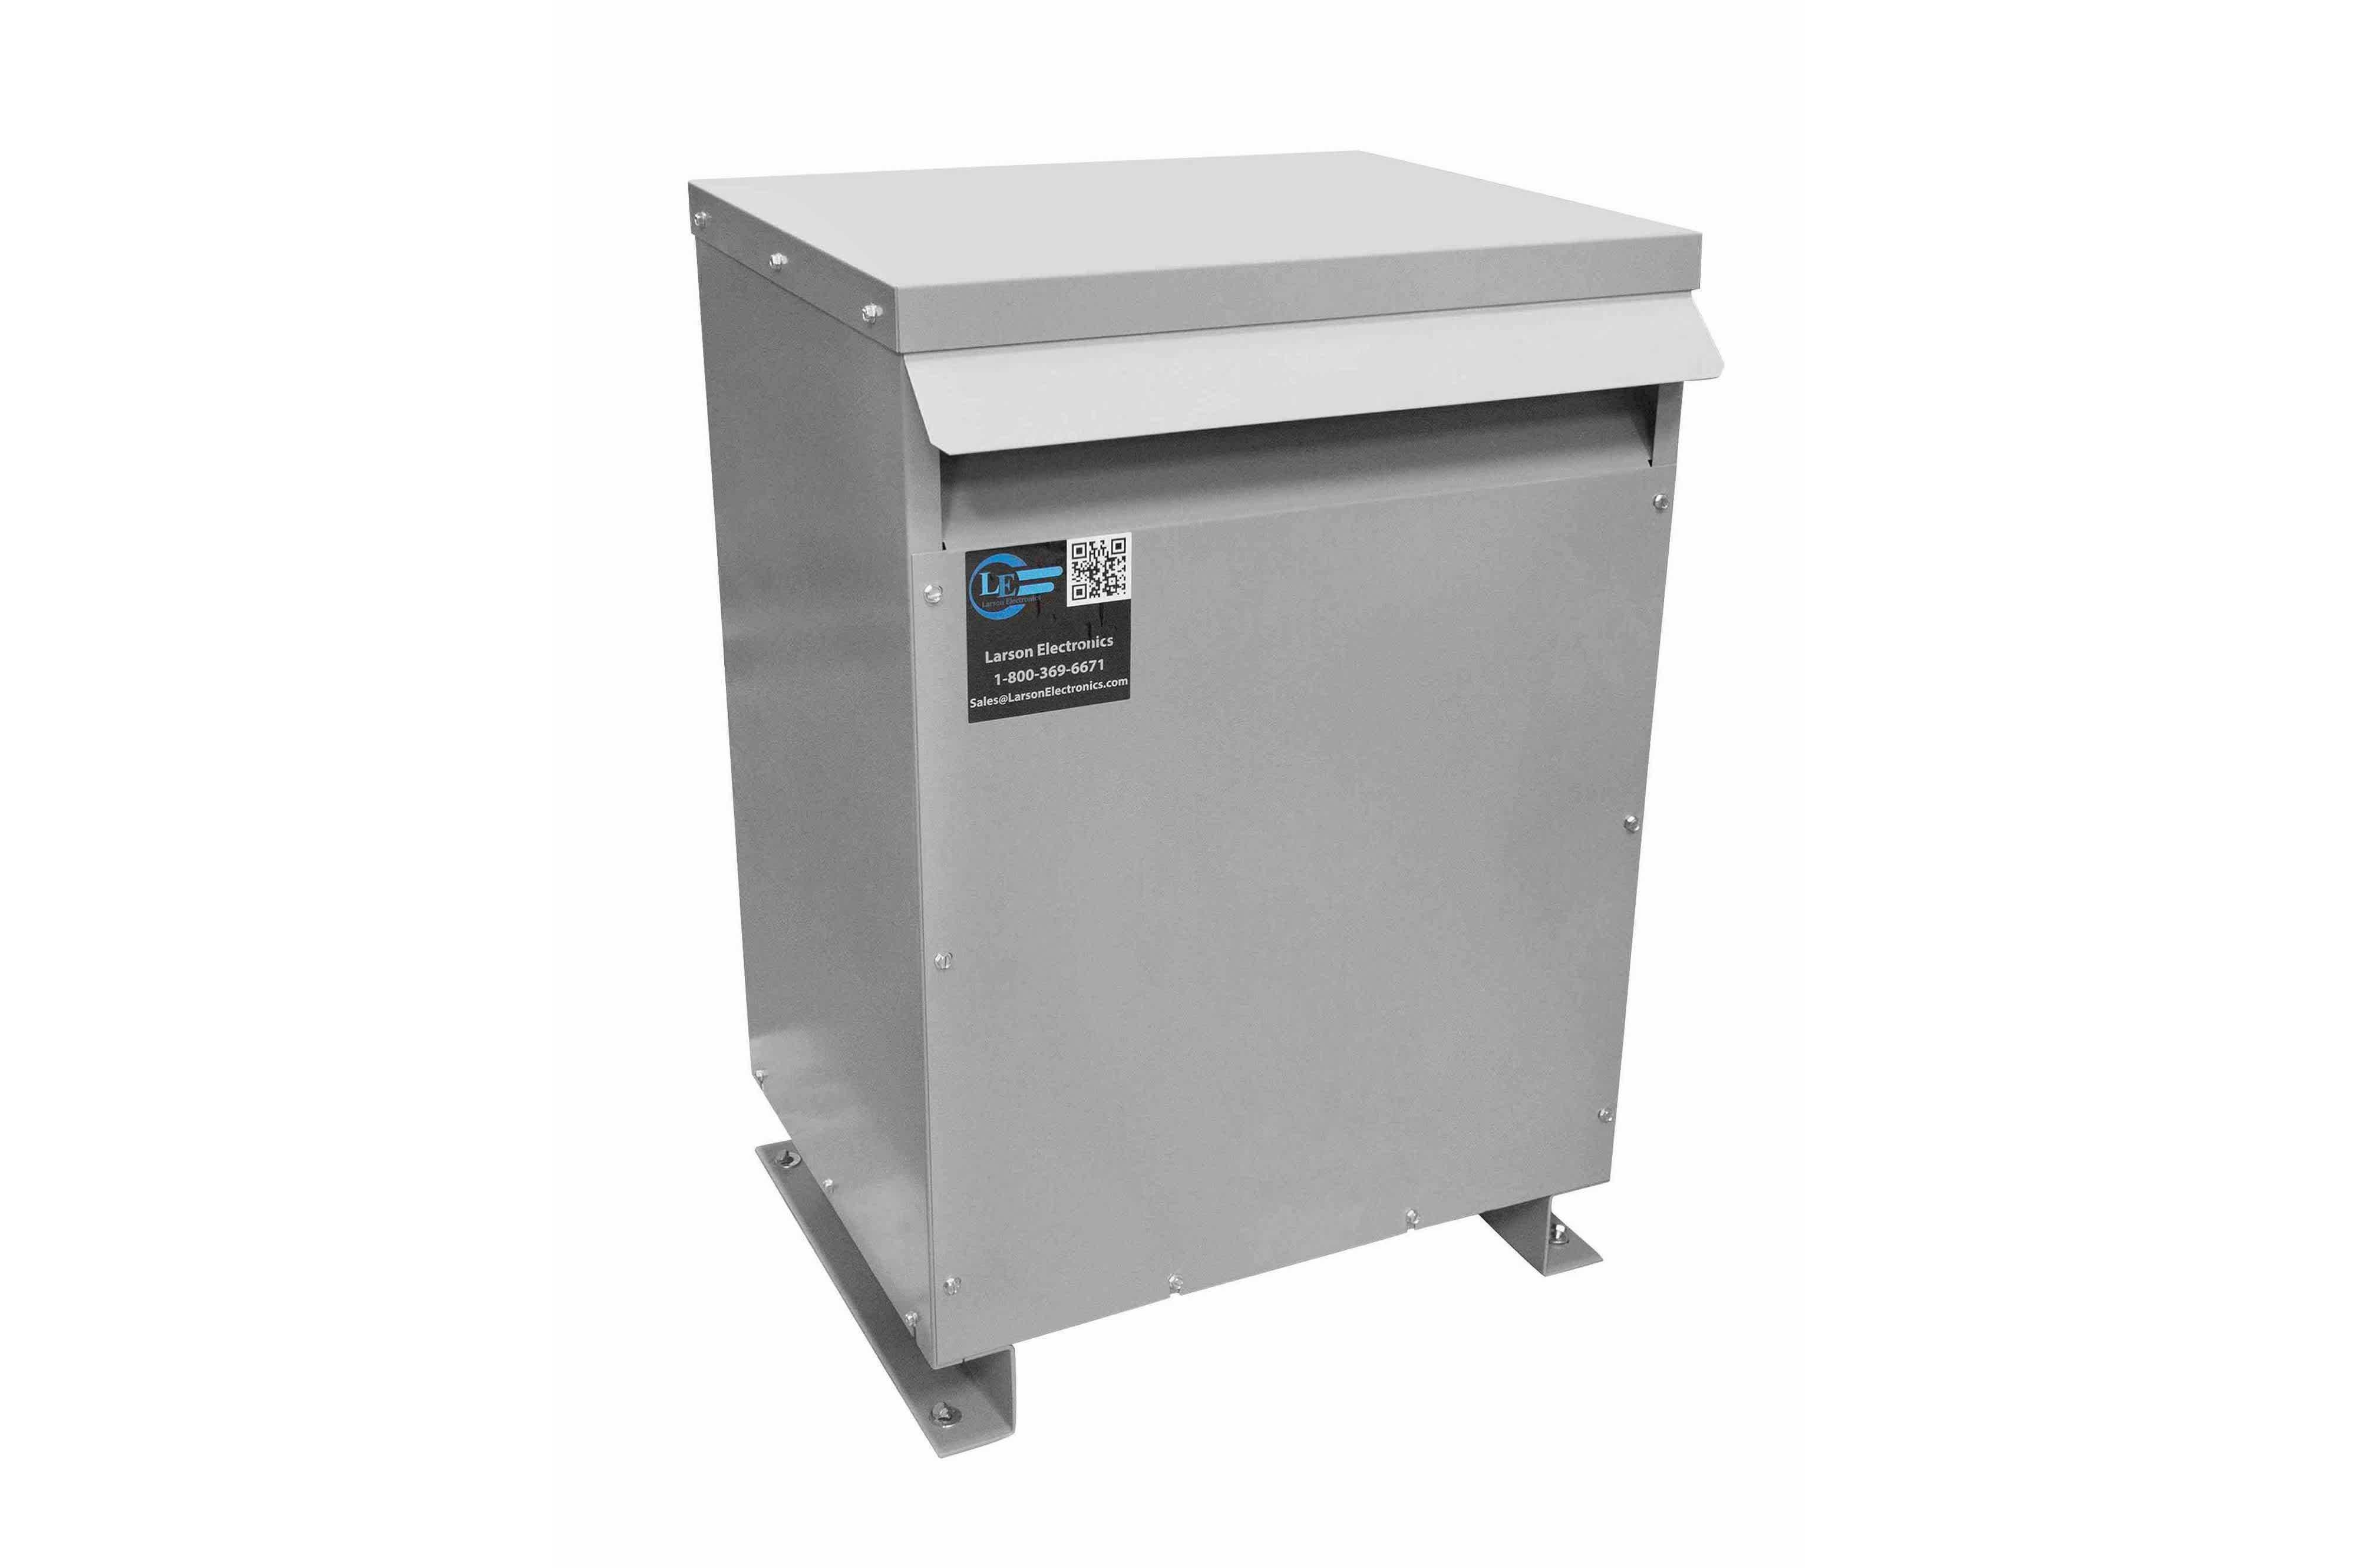 115 kVA 3PH Isolation Transformer, 460V Wye Primary, 380V Delta Secondary, N3R, Ventilated, 60 Hz